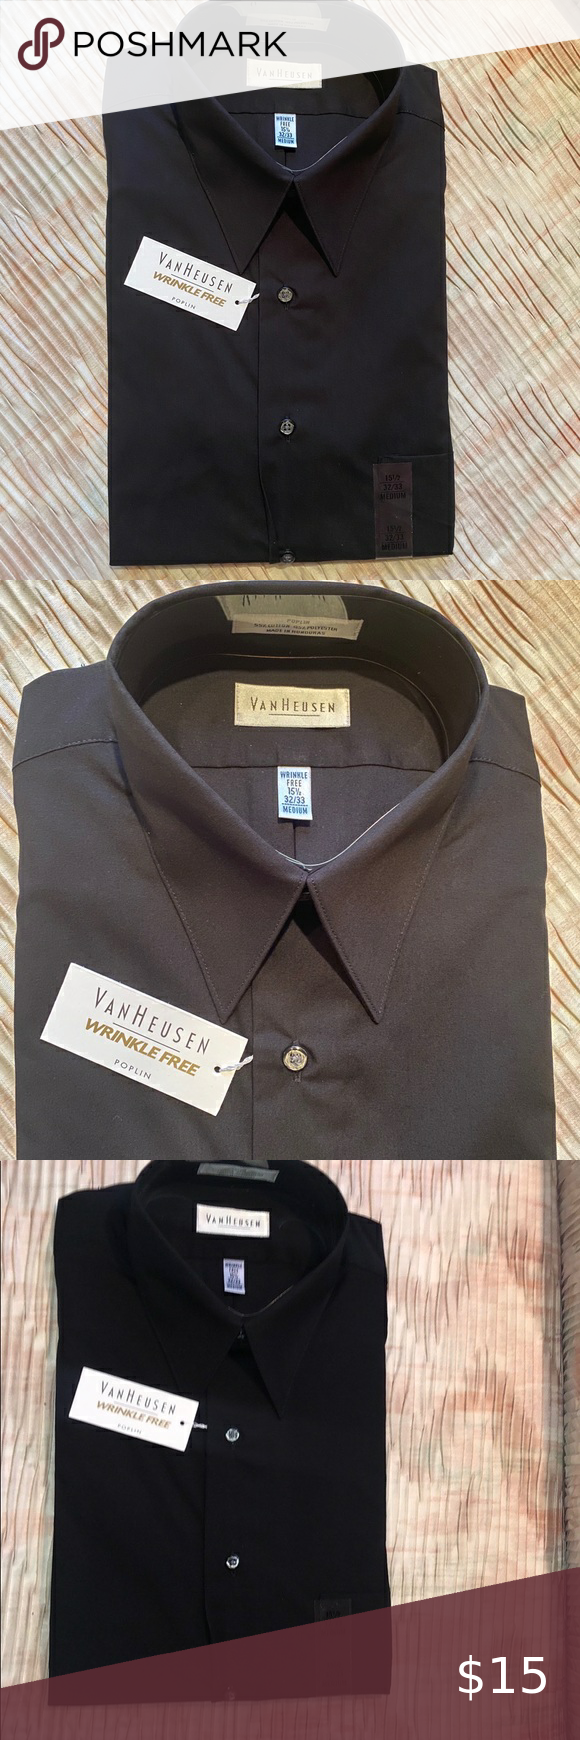 Van Heusen Nwt Men S Black Dress Shirt Black Dress Shirt Men Black Shirt Dress Mens Shirt Dress [ 1740 x 580 Pixel ]